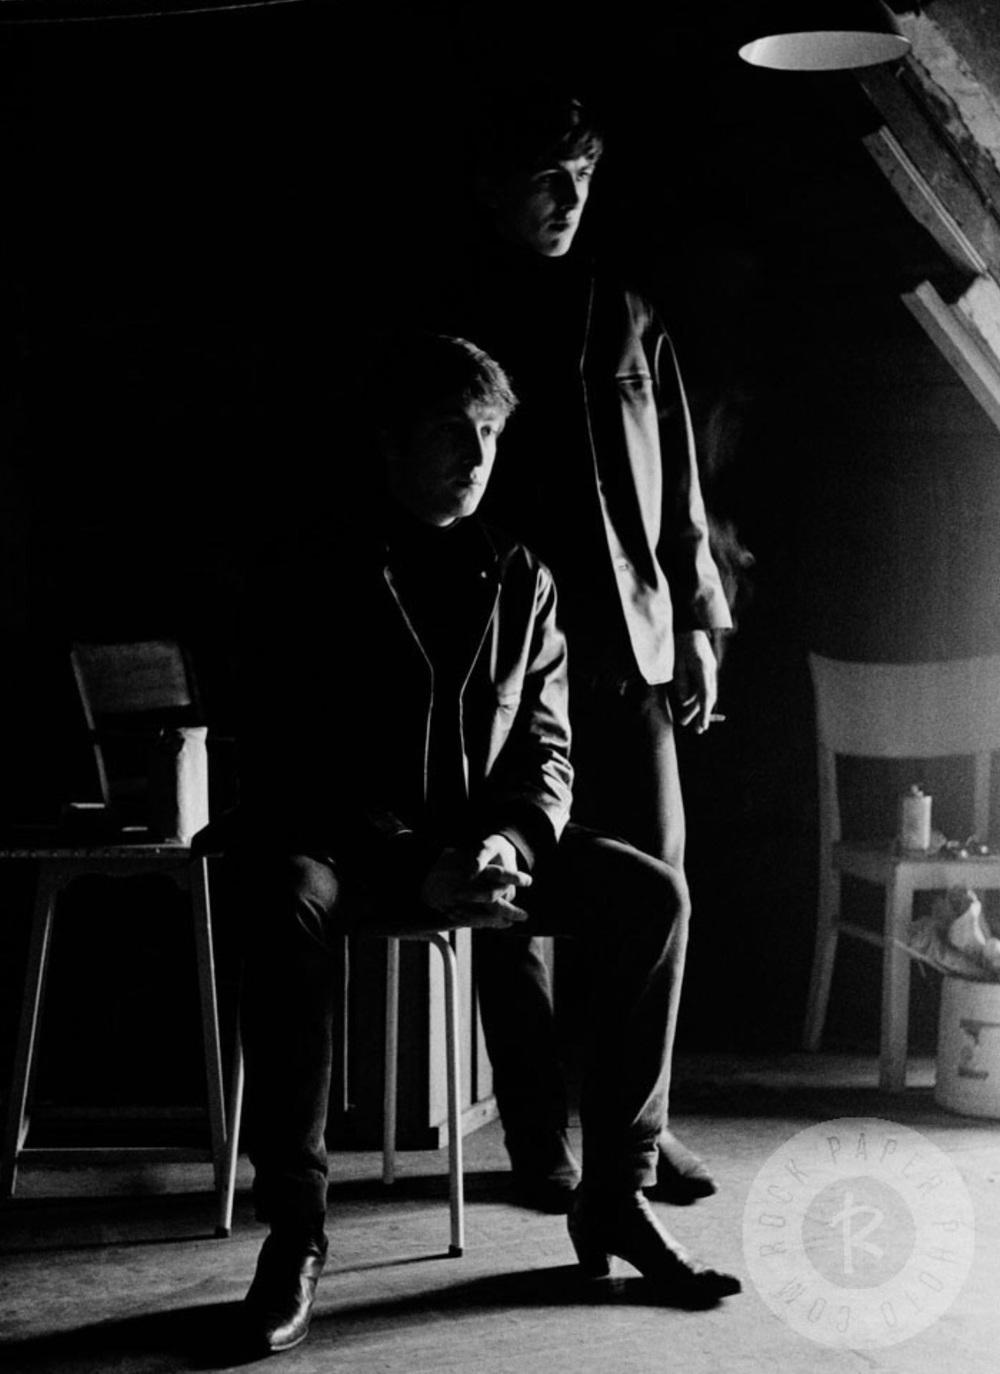 John Lennon and George Harrison in Hamburg, 1962.Photo by Astrid Kirchherr.